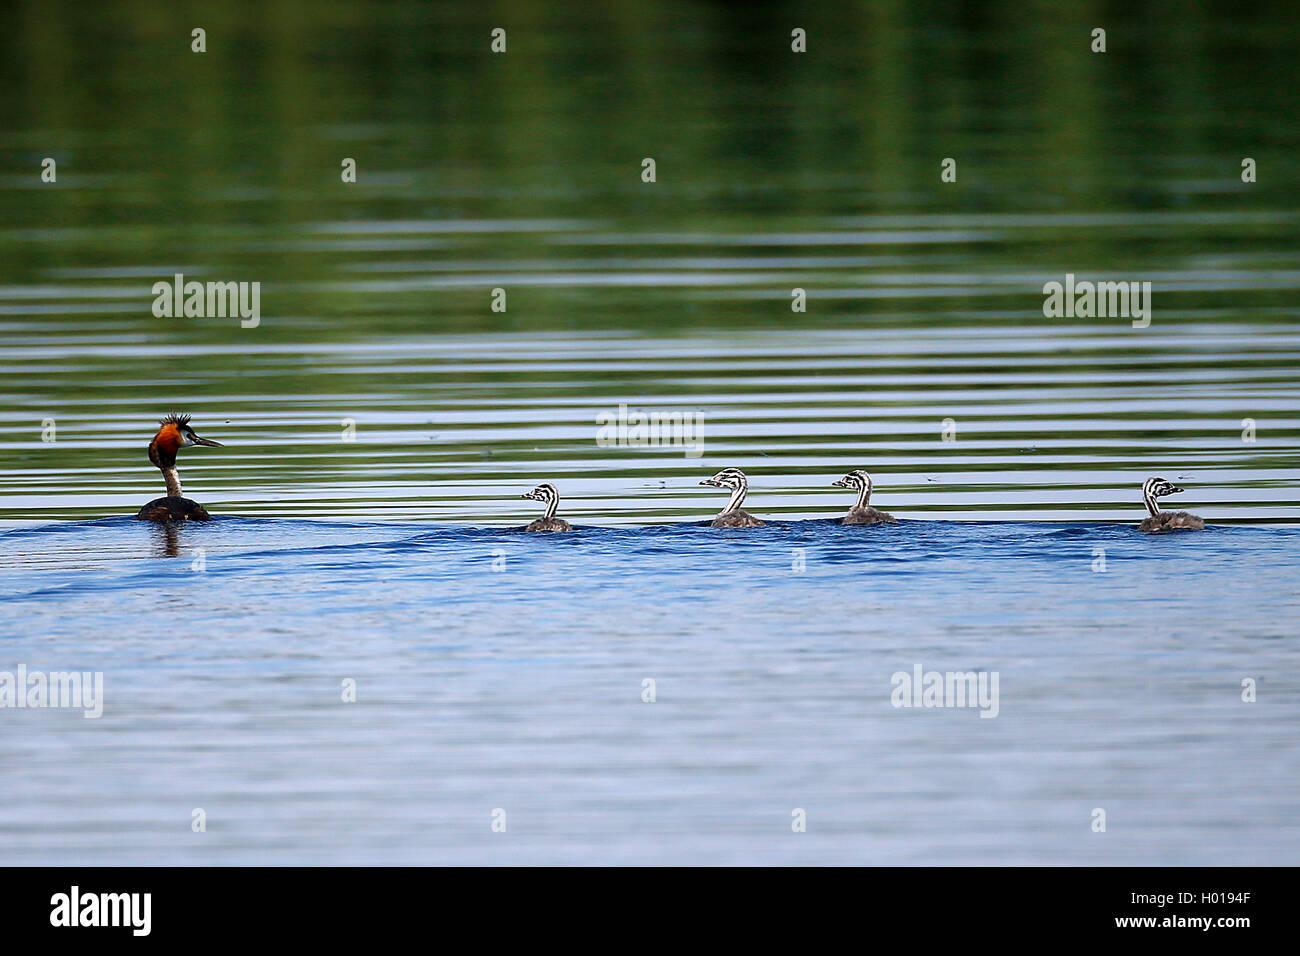 Haubentaucher, Hauben-Taucher (Podiceps cristatus), Altvogel mit vier Kueken, Rumaenien, Donaudelta   great crested - Stock Image